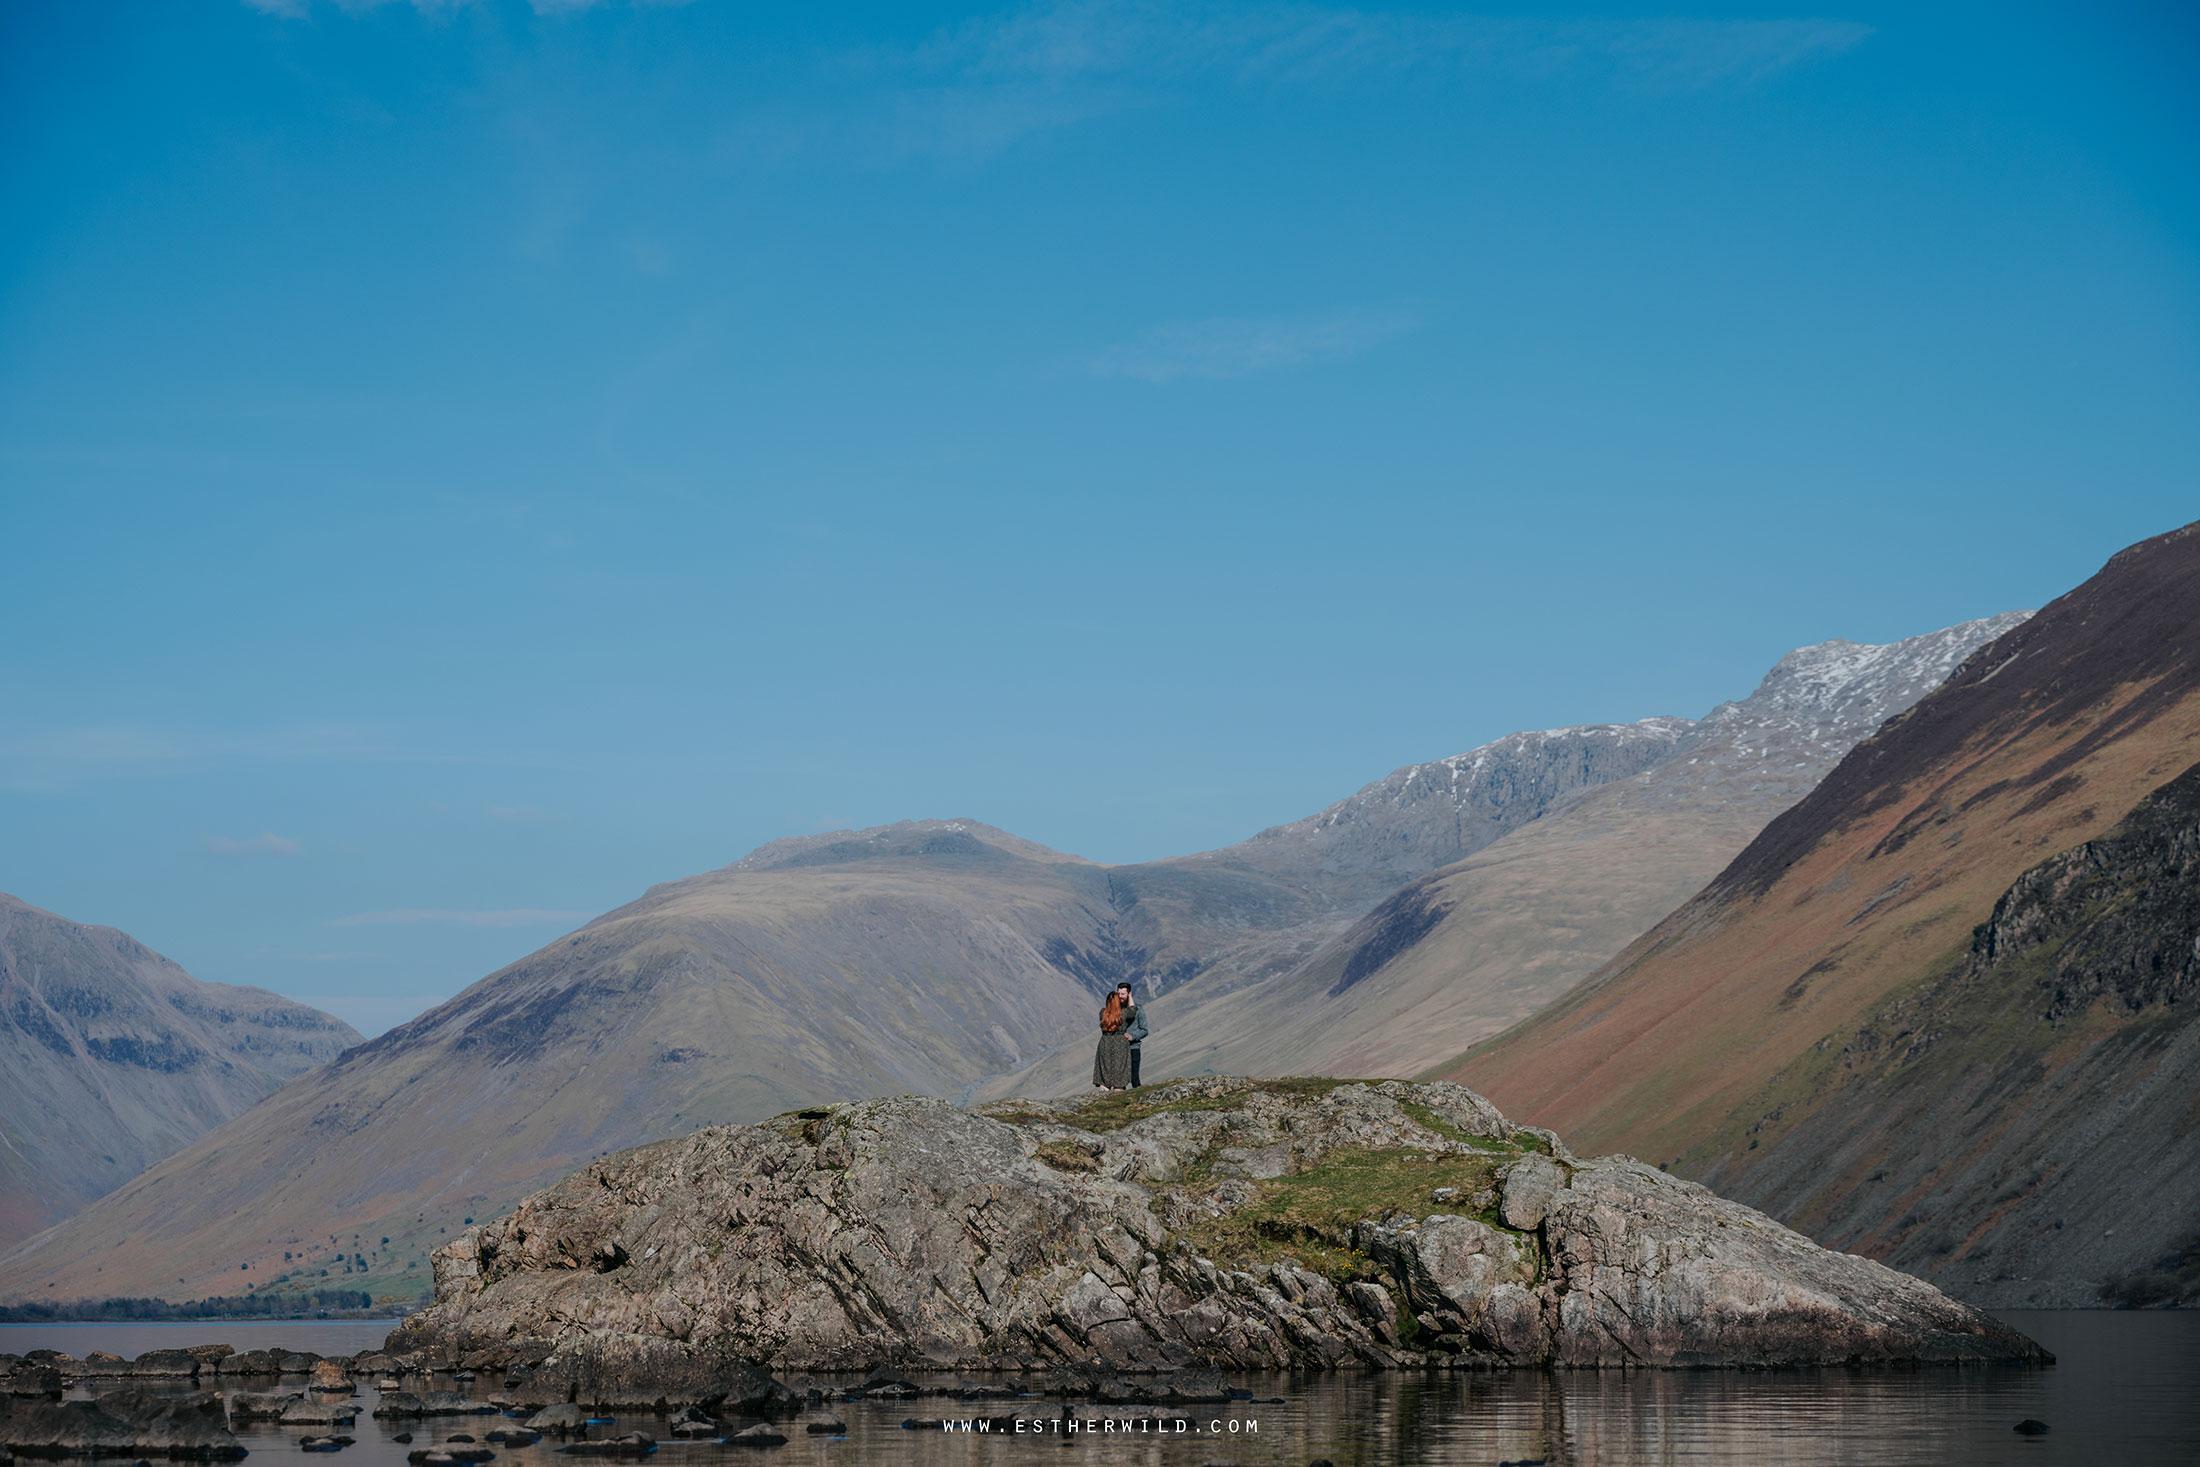 Cumbria_Lake_District_Wasdale_Wedding_Photographer_Destination_Engagement_Anniversary_Esther_Wild_IMG_3447.jpg